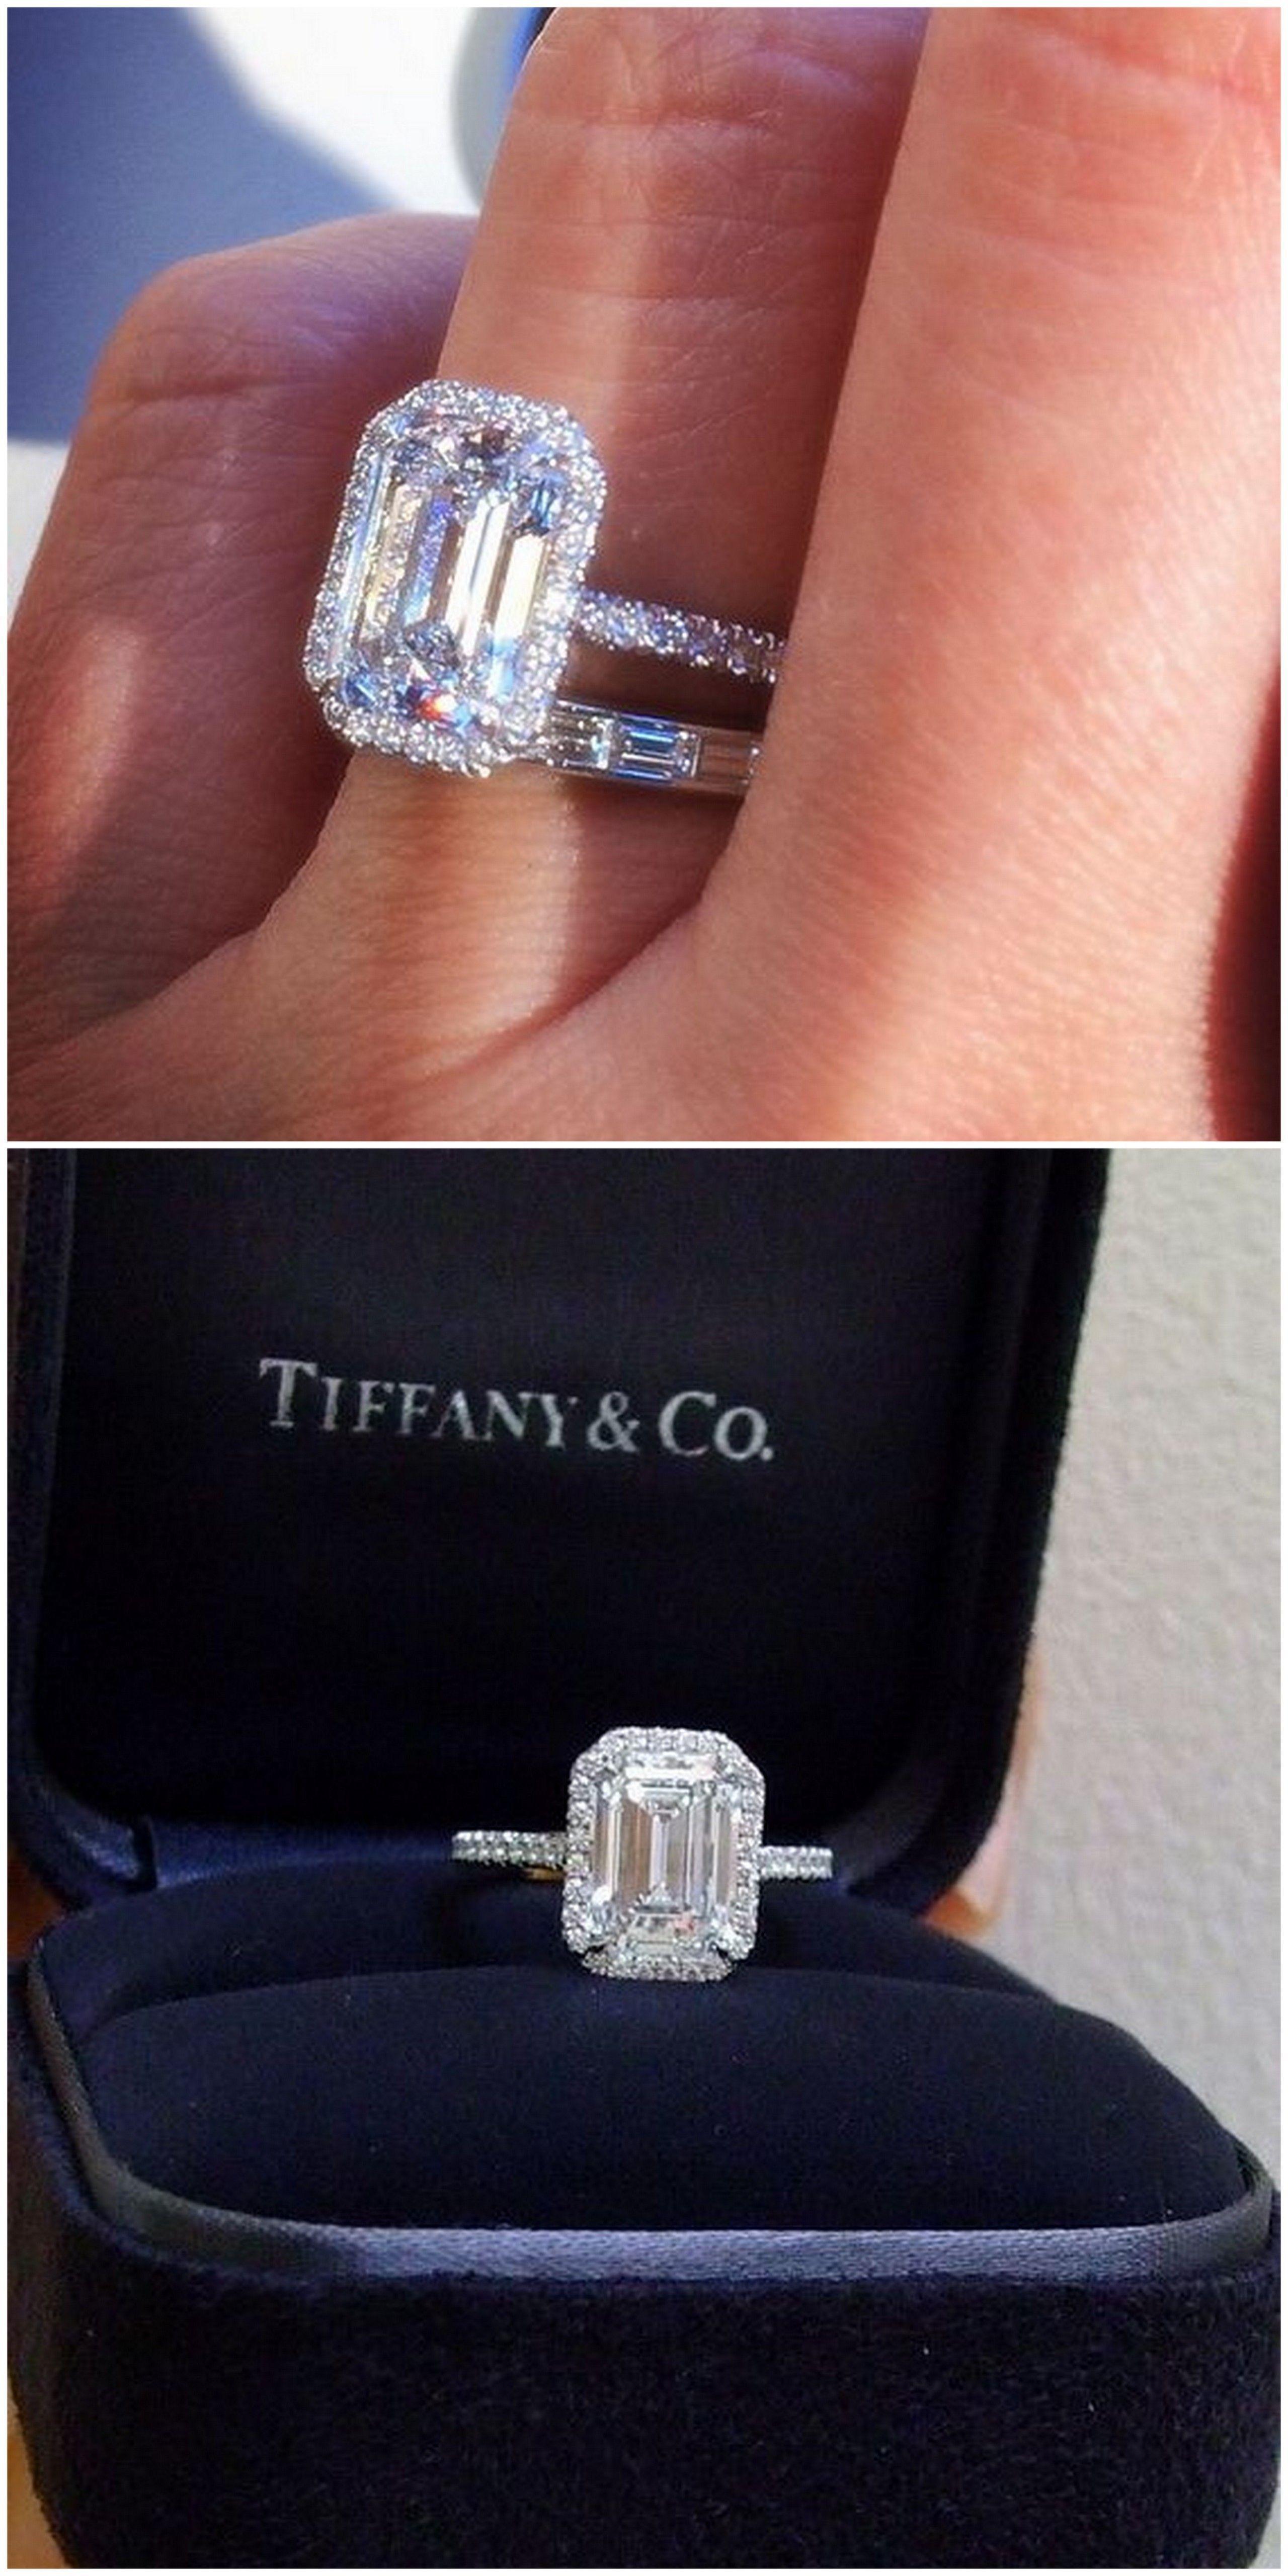 cf6b20d9c1a Tiffany   Co. 2.5 ct Soleste Emerald Cut Platinum Diamond Engagement Ring